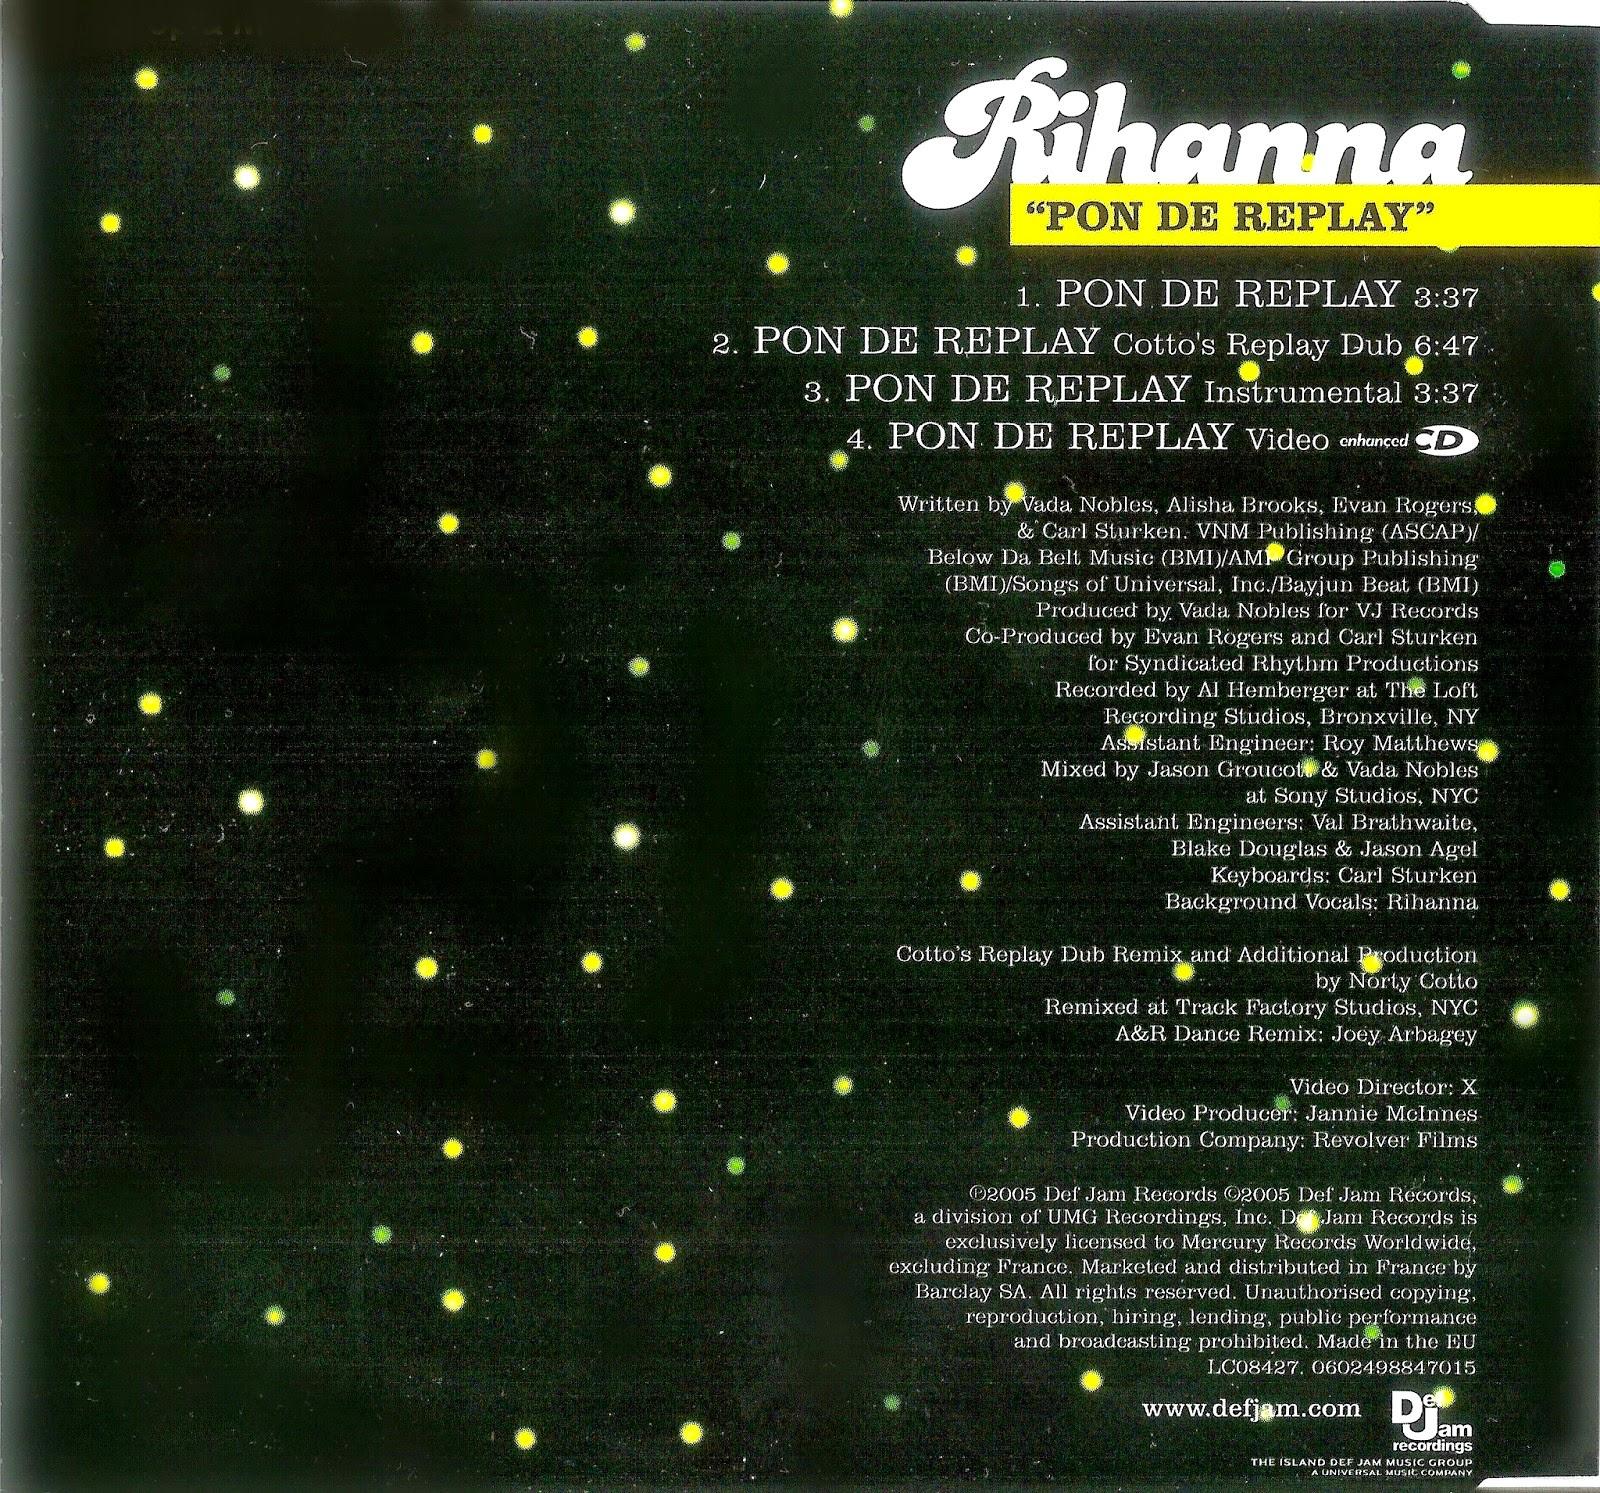 Encartes pop single rihanna pon de replay tags booklet rihanna single ccuart Images